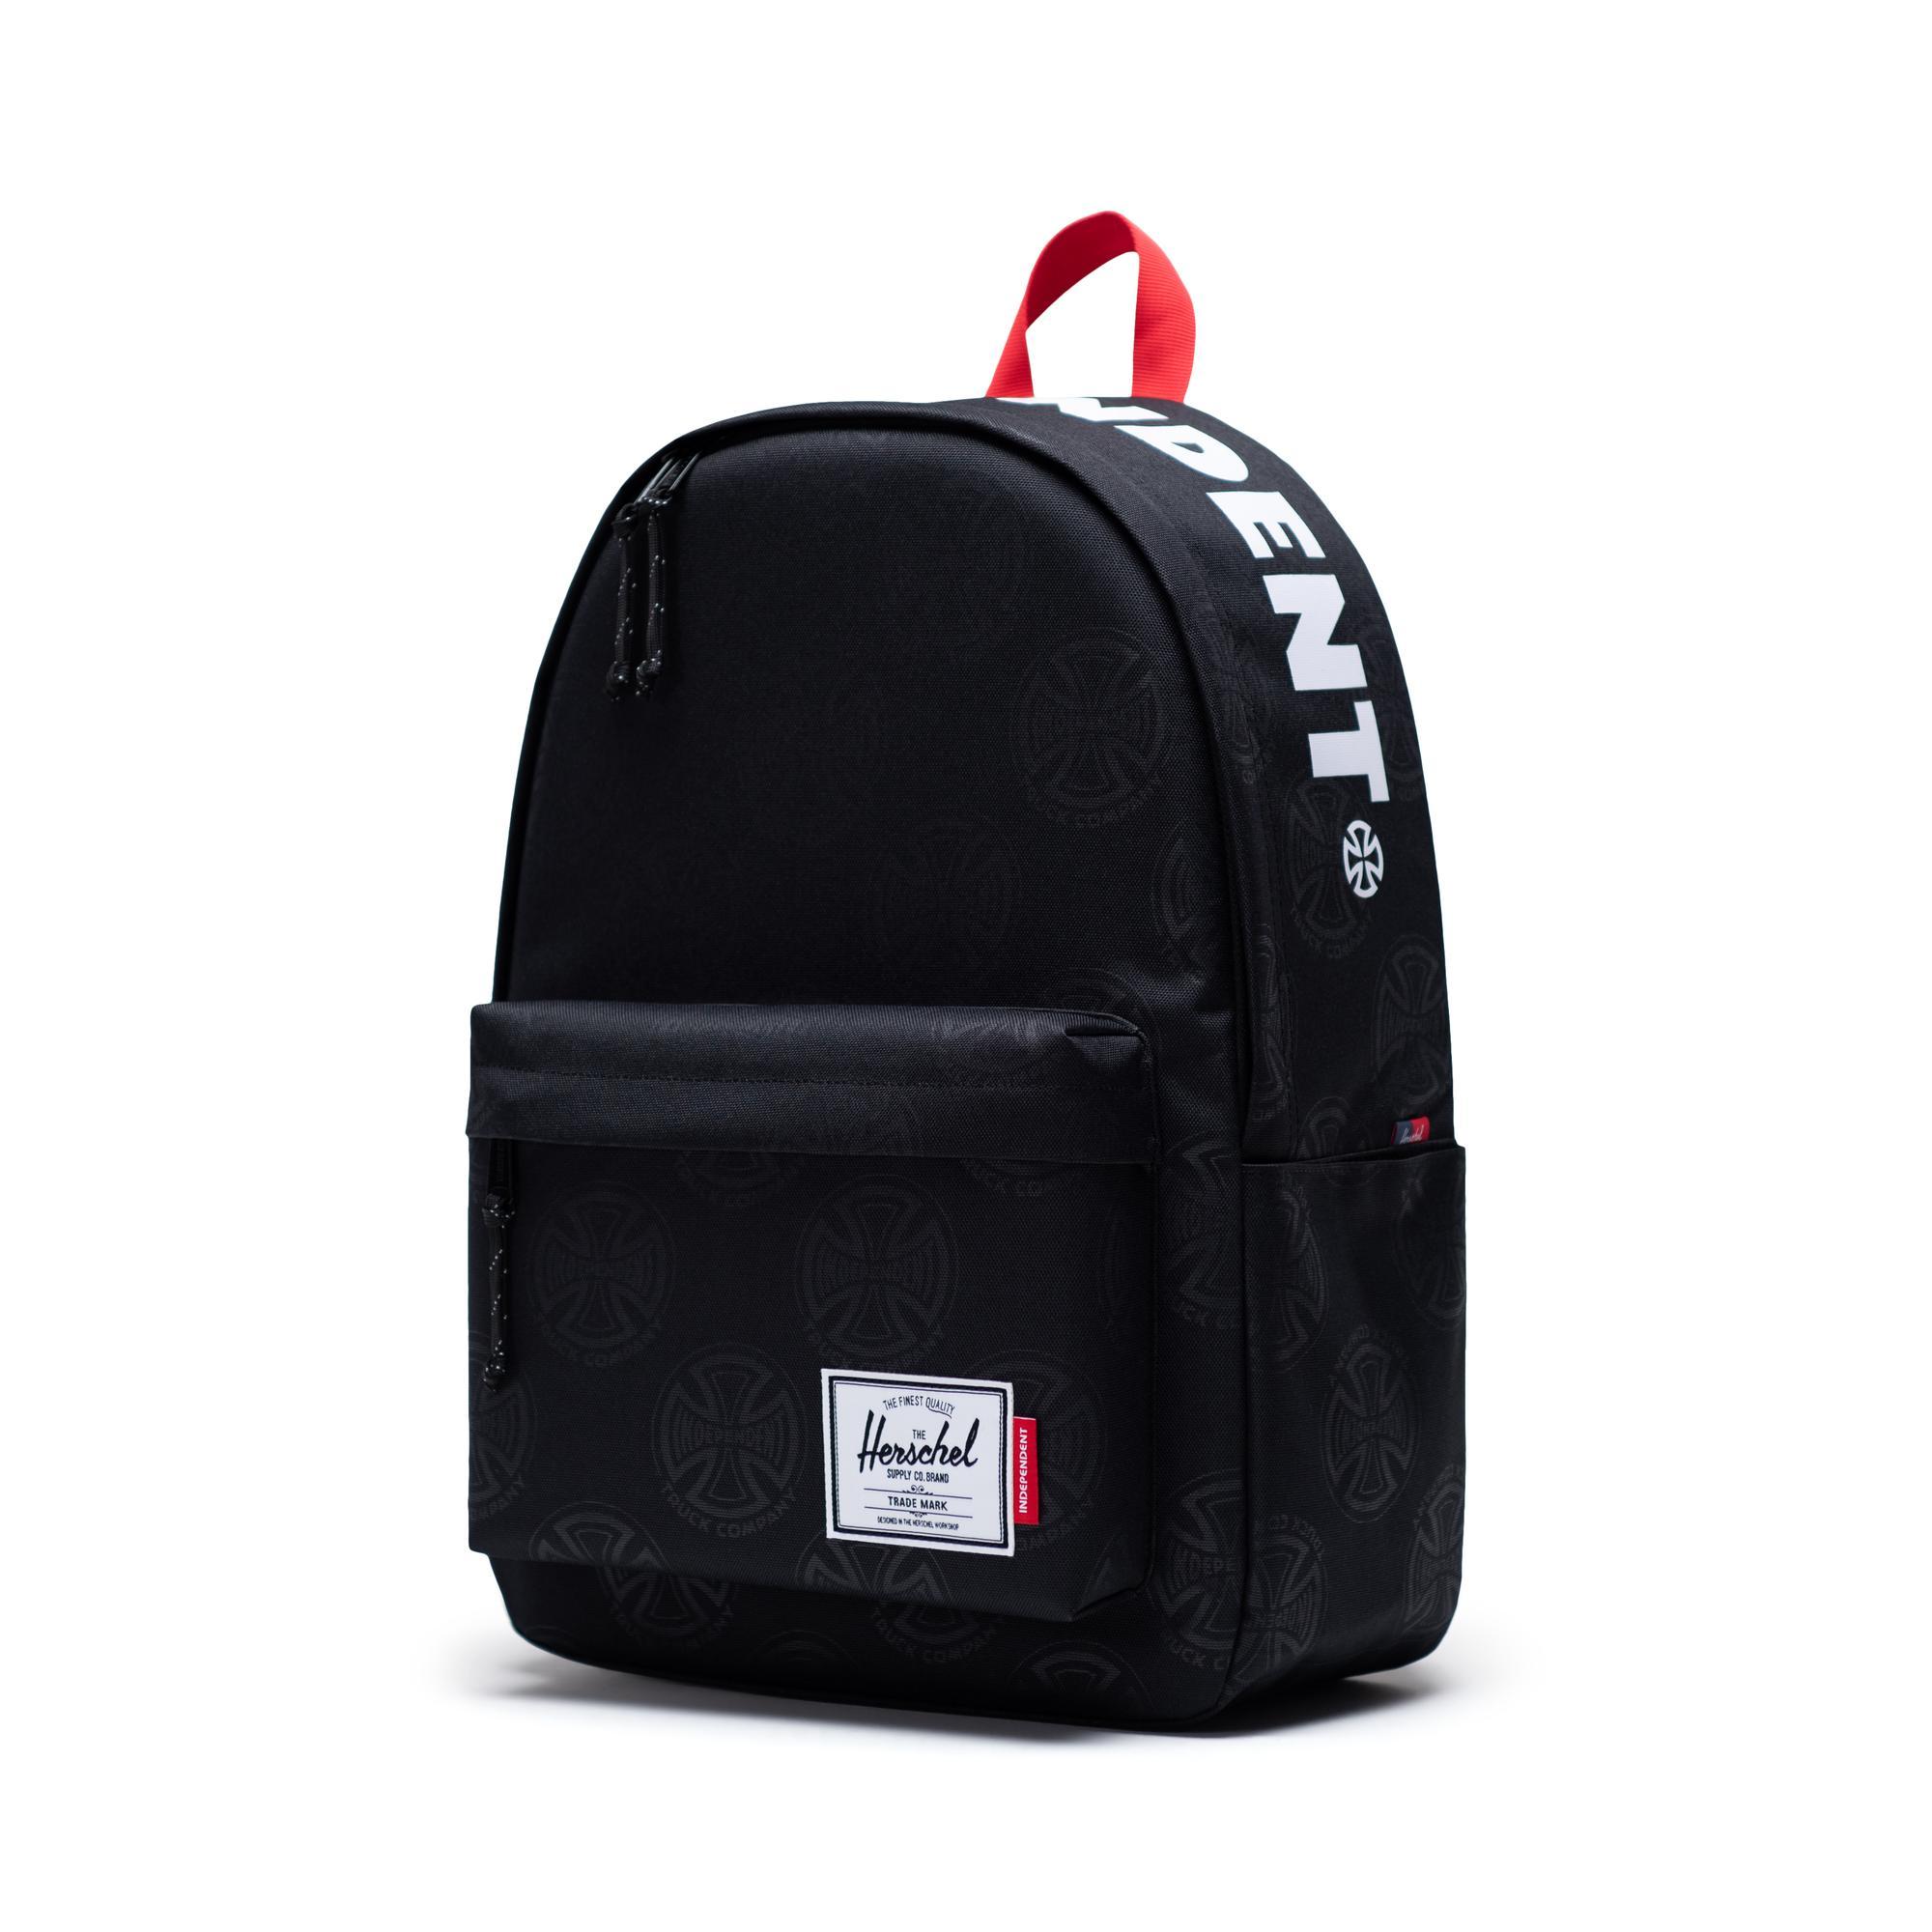 Backpack Independent Classic X-Large Herschel Black Unisex